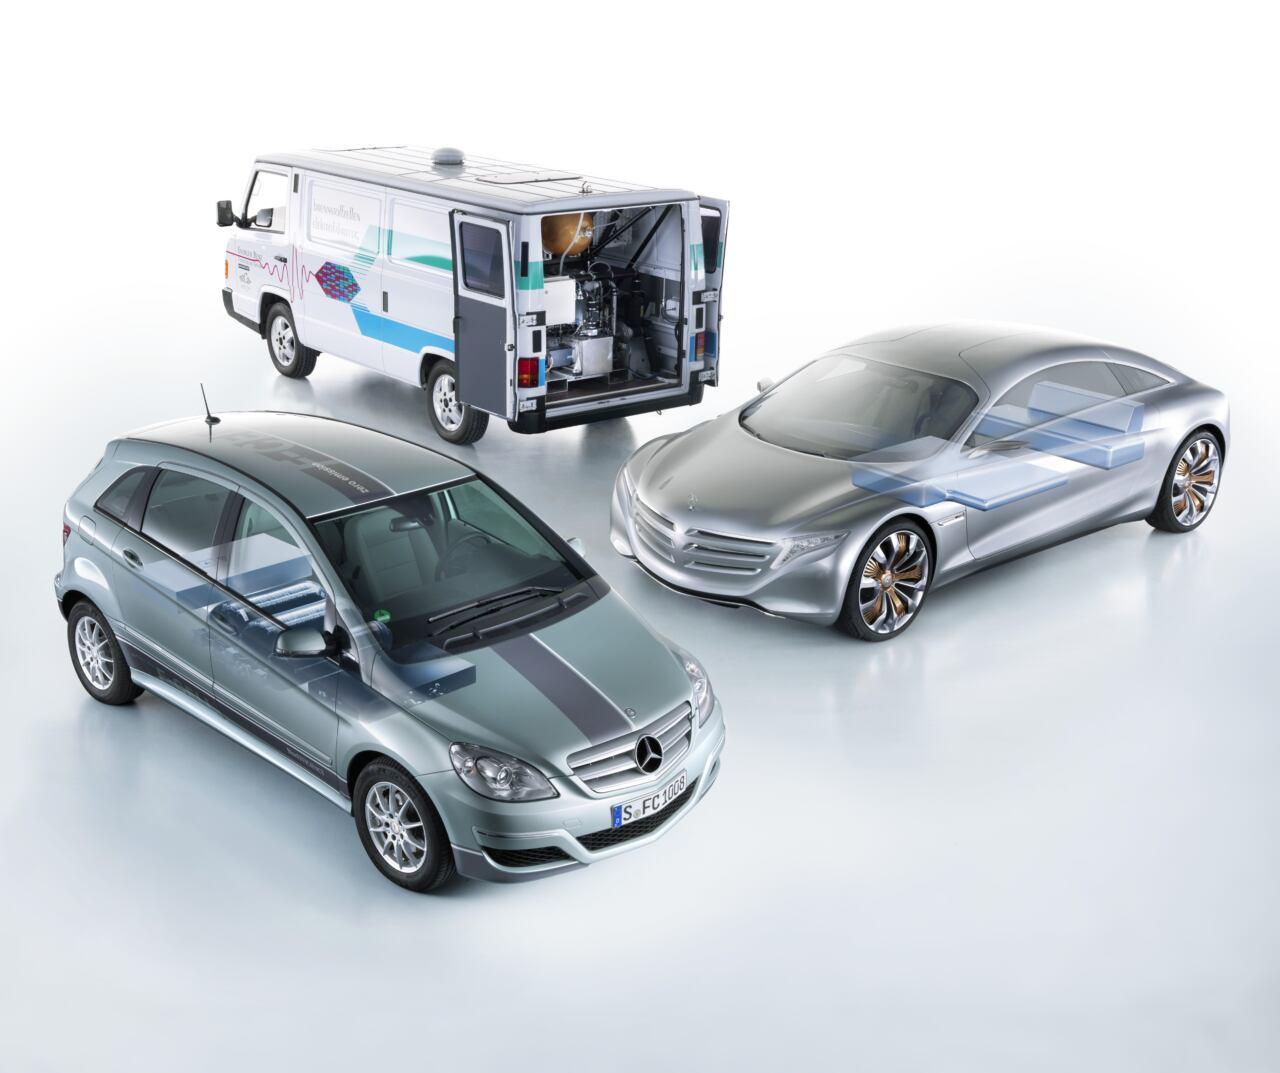 Daimler celle a combustibile 30 anni fa